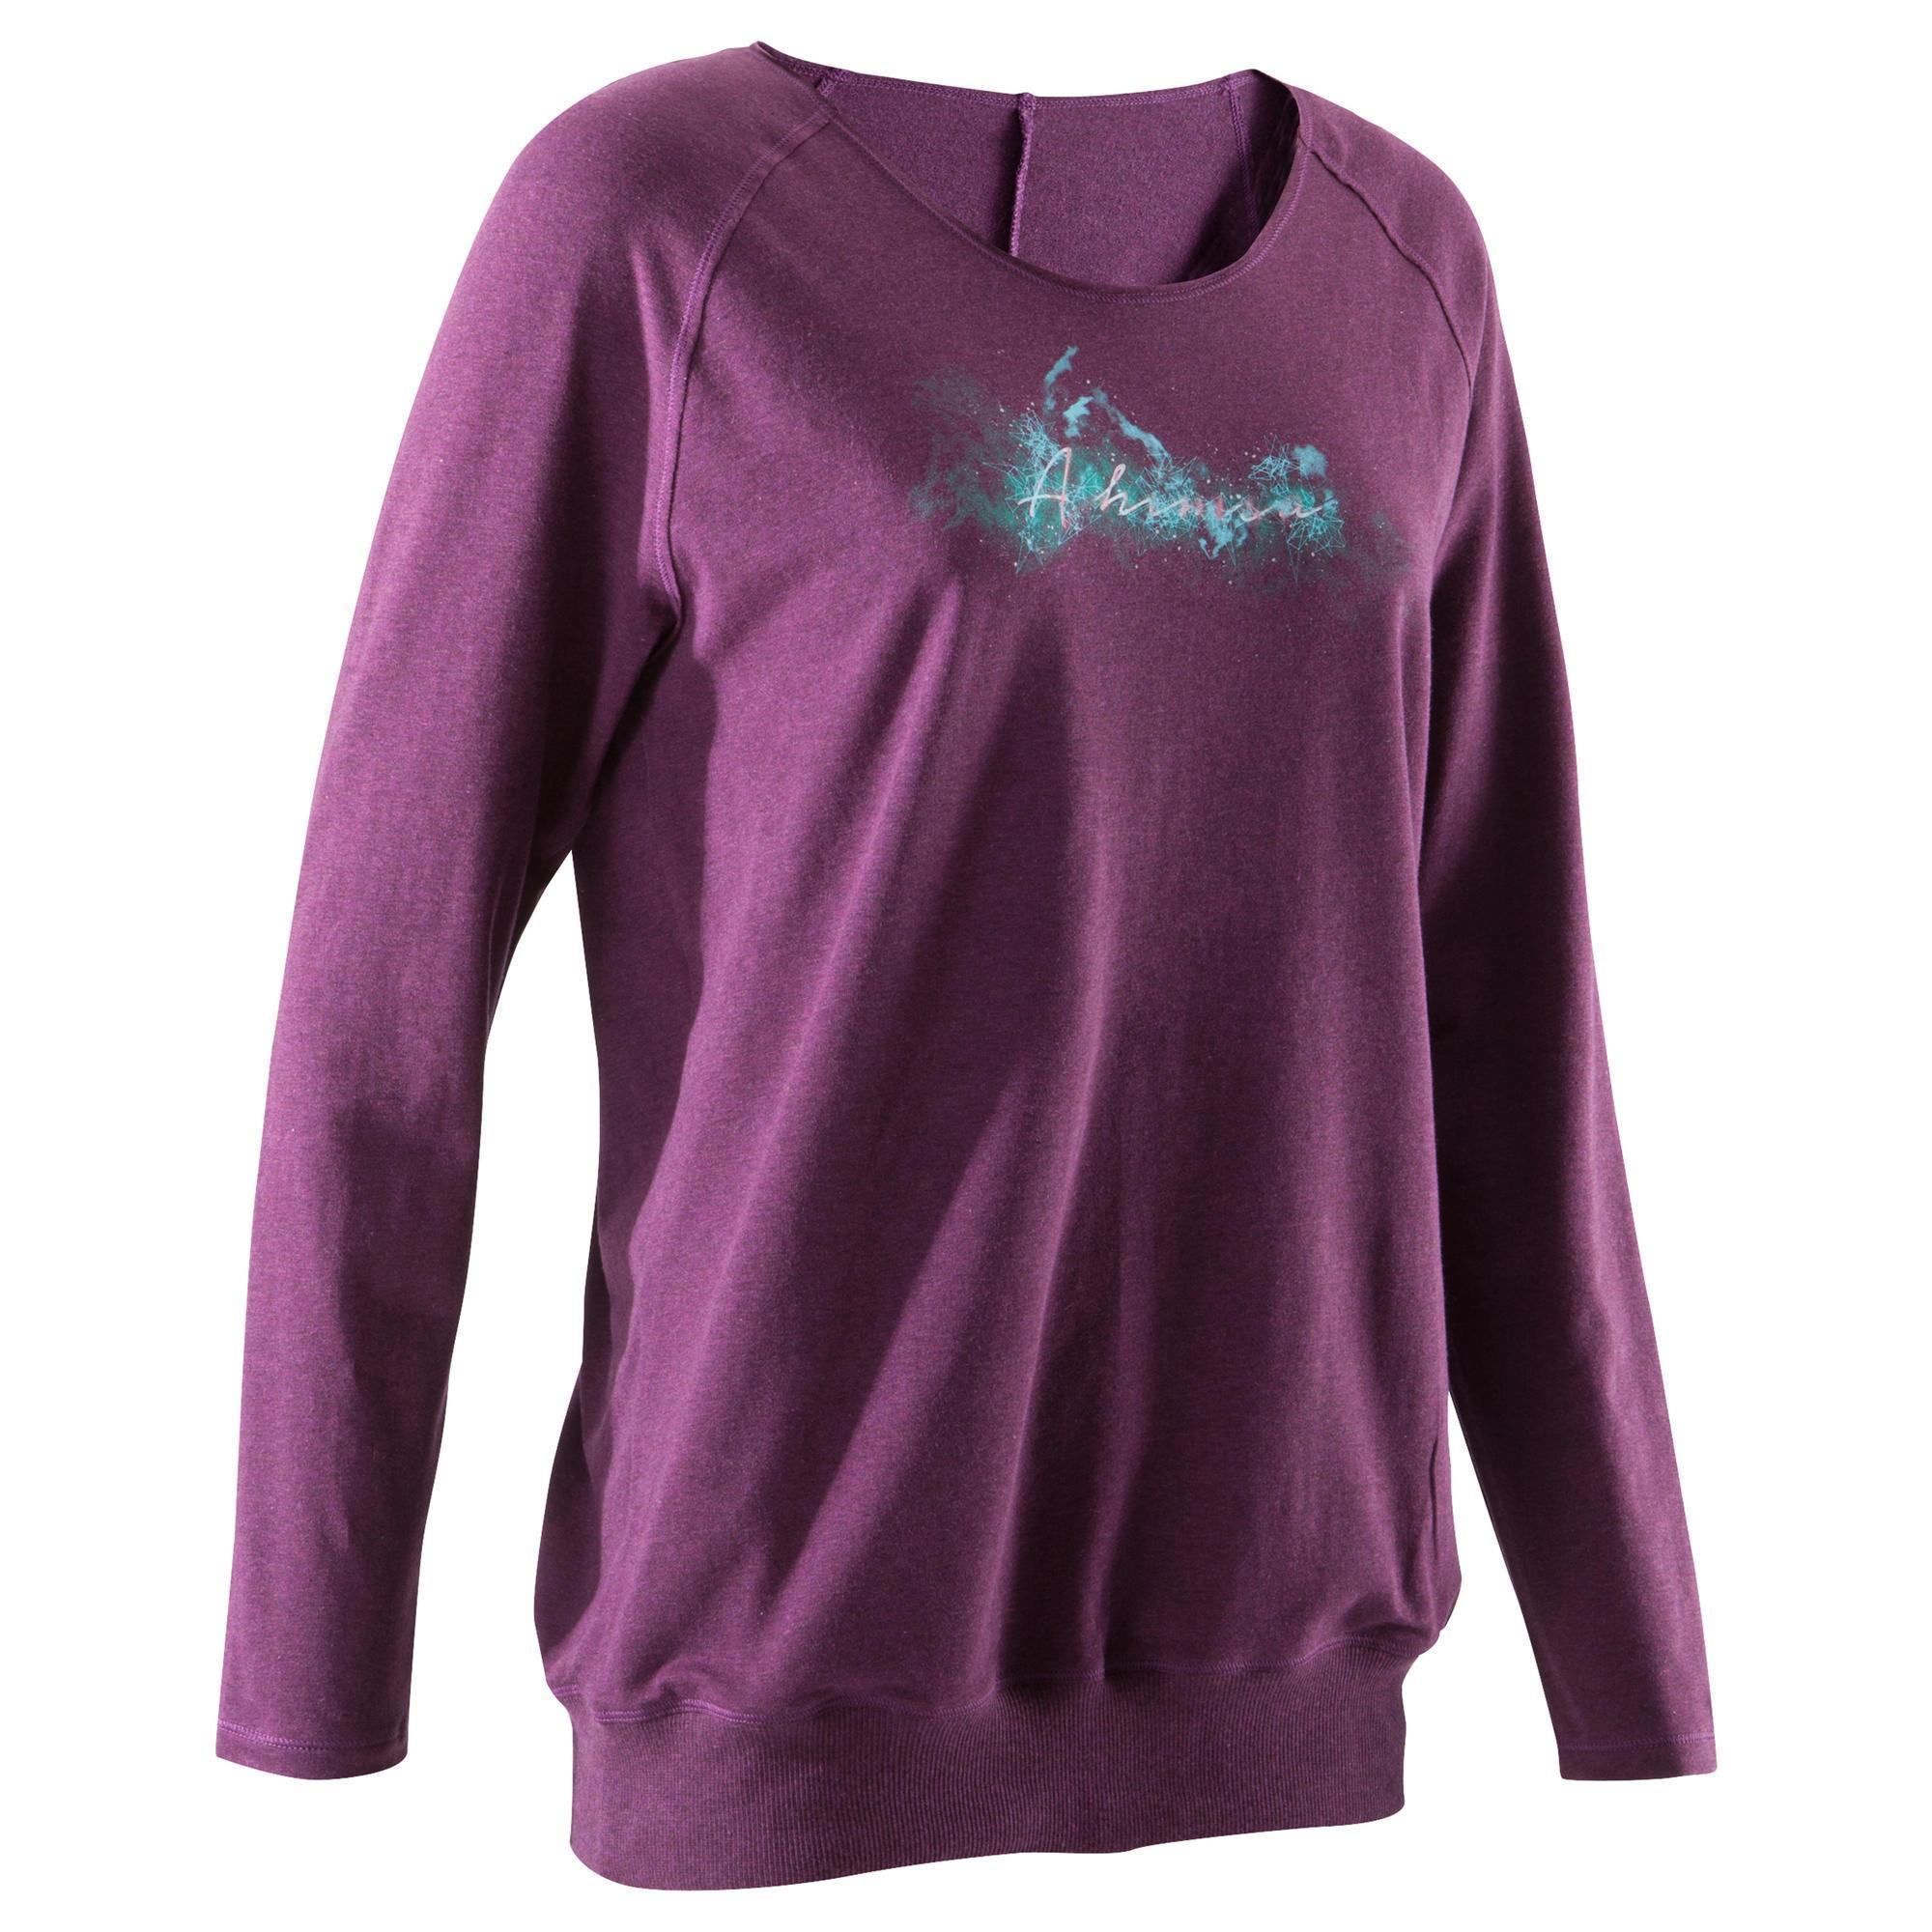 10894c3564 T-shirt donna yoga 100 cotone bio bordeaux | Domyos by Decathlon